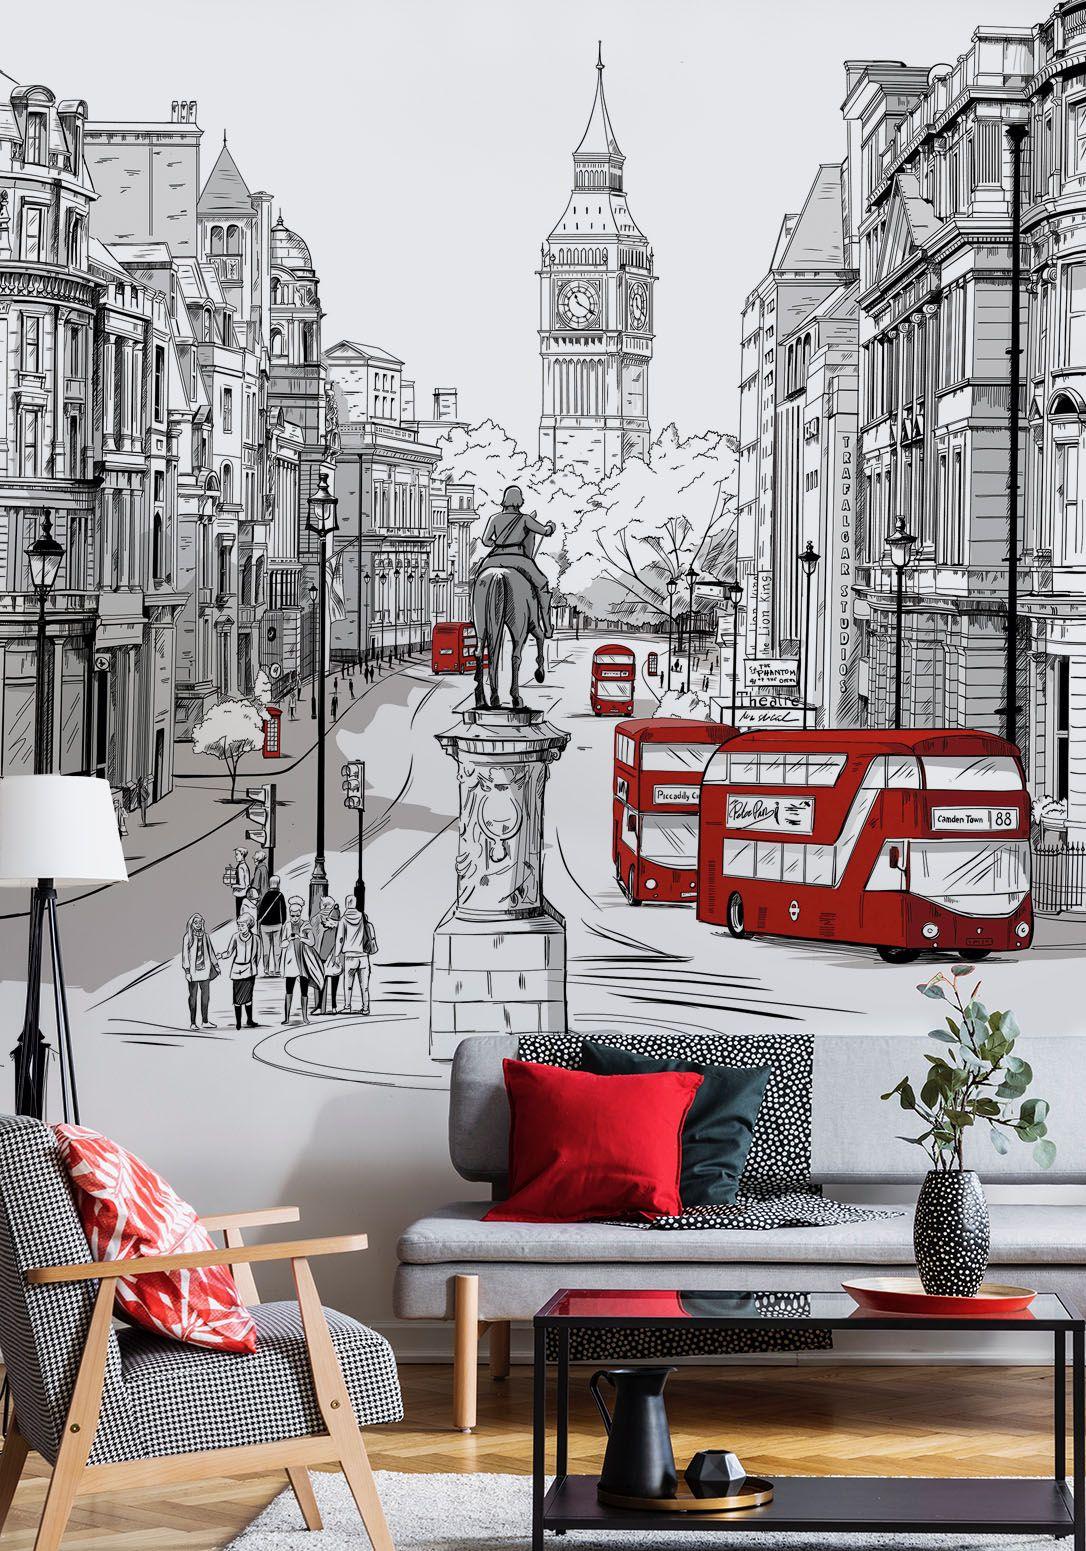 London mural big ben wallpaper street city london